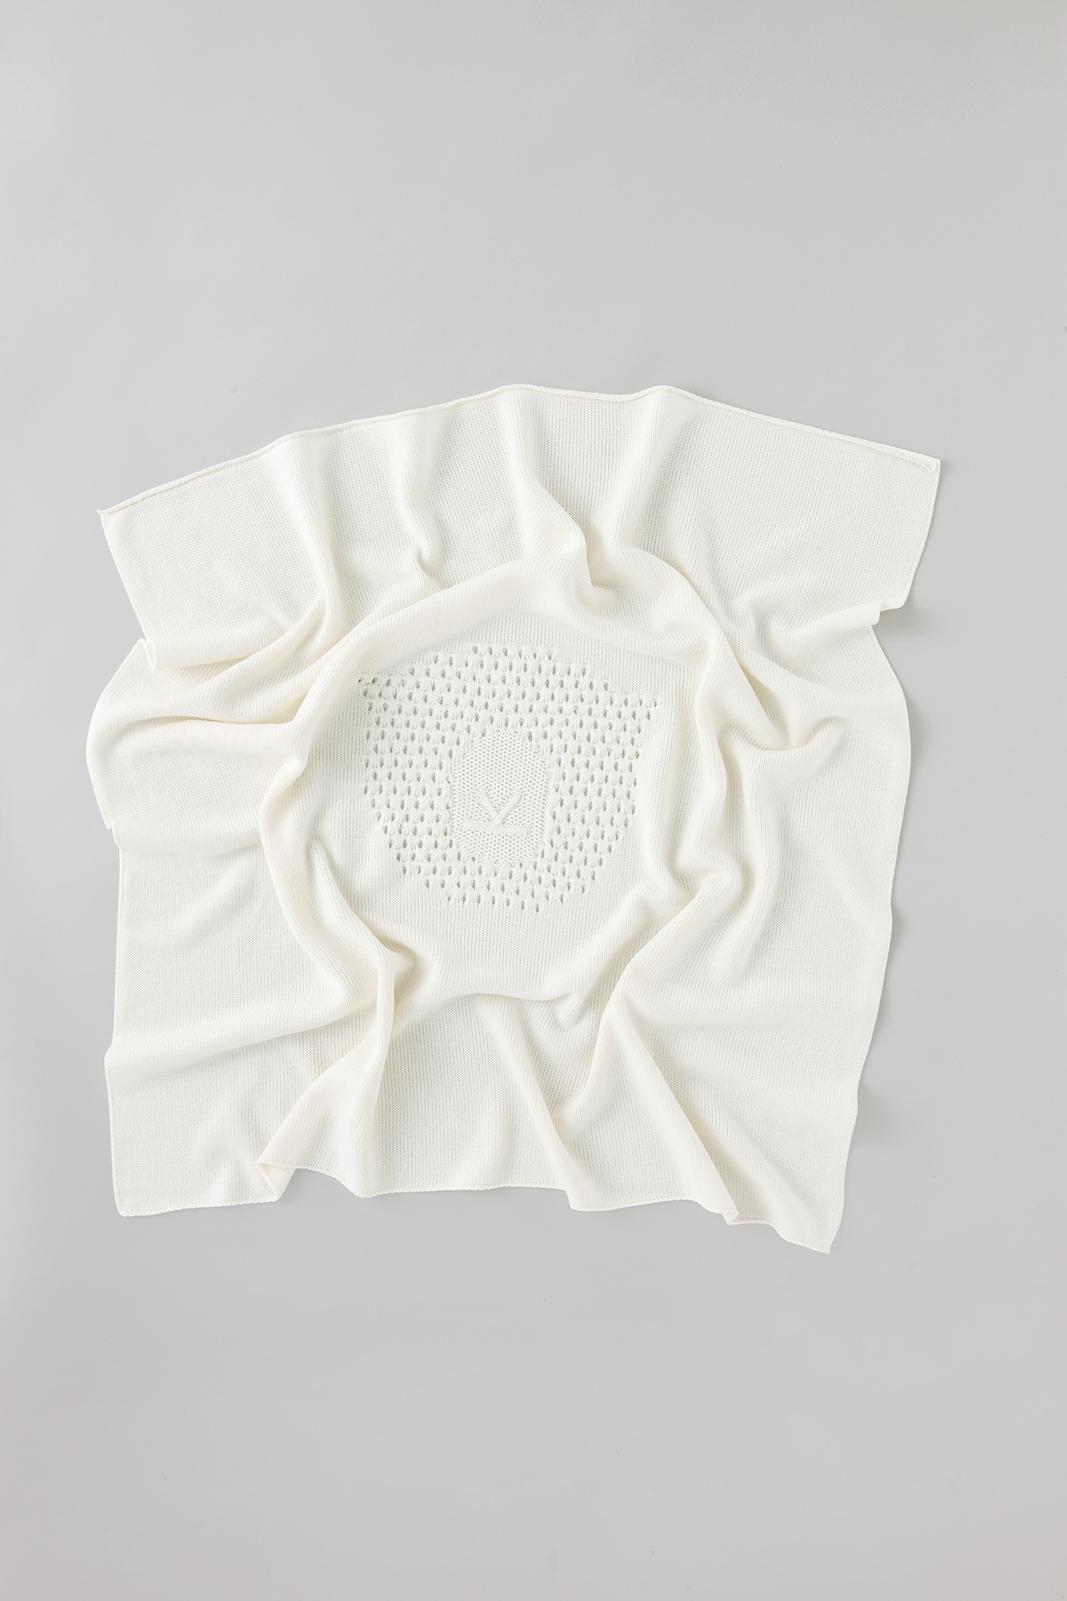 Camphor カンフル kids こども 子供服 animal blanket 日本製 madeinjapan